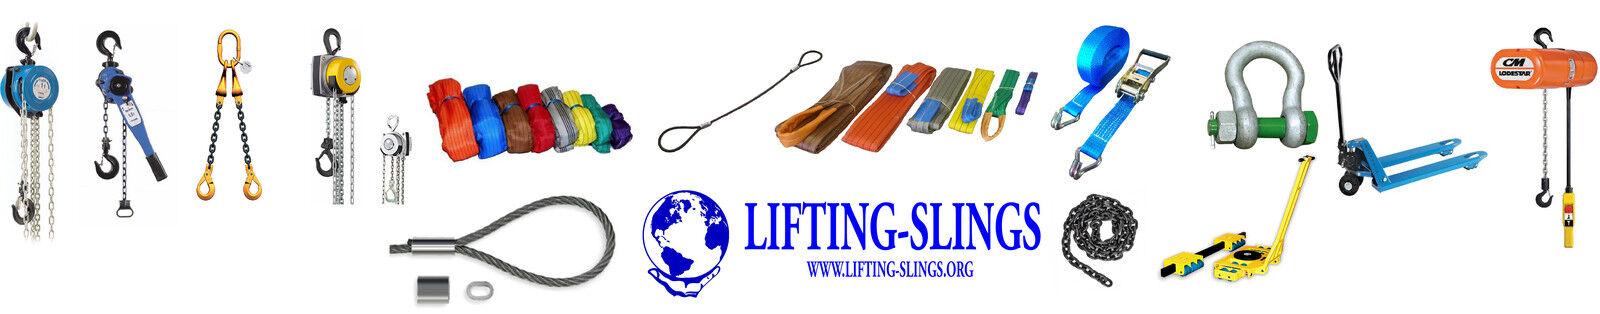 lifting-slings